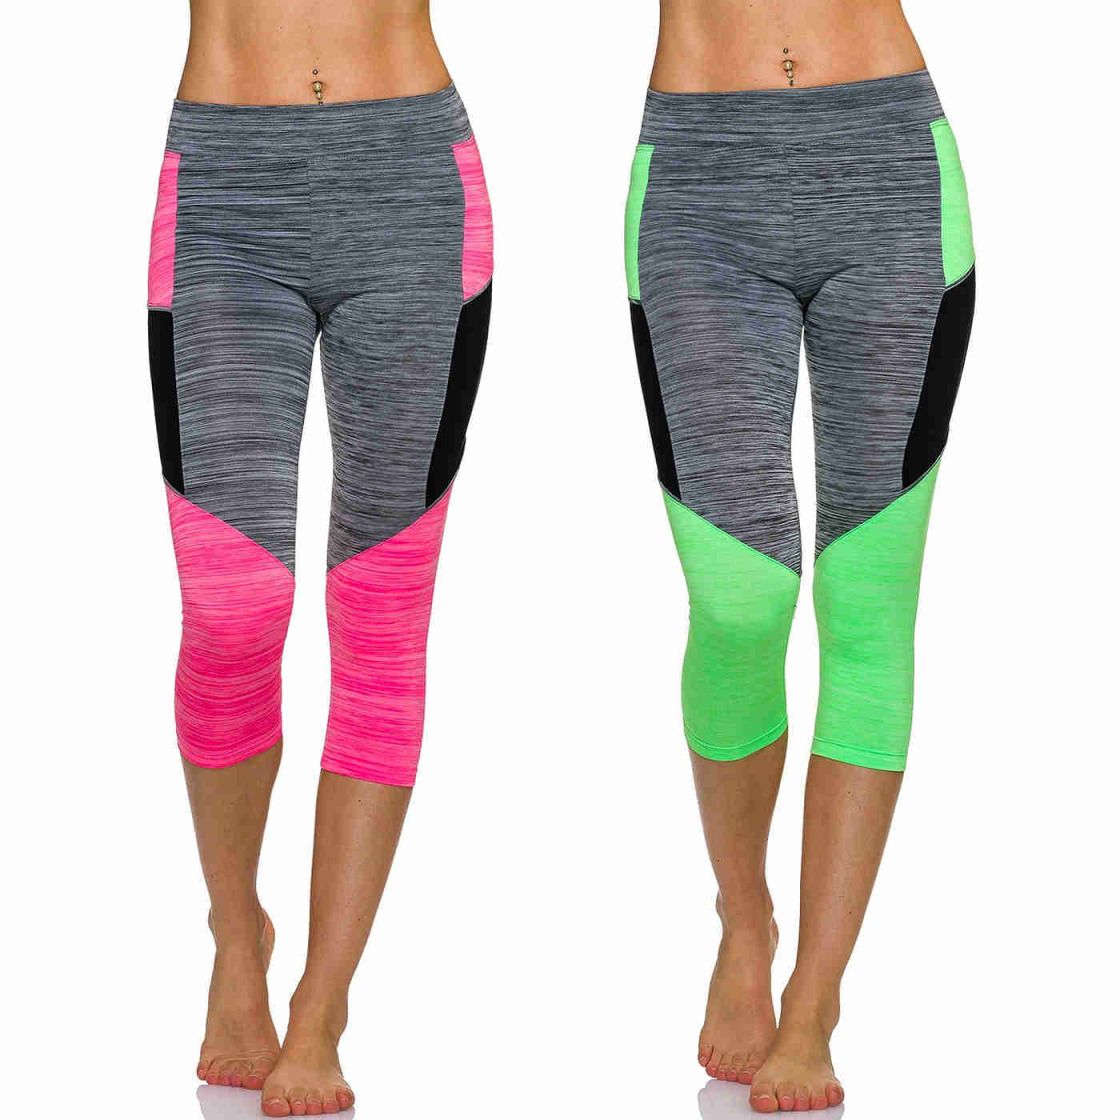 a580bba31a8336 Streifen-Kombination; Adiyaro Damen Fitness 3/4 Capri Sport-Leggings Neon  m. Streifen-Kombination